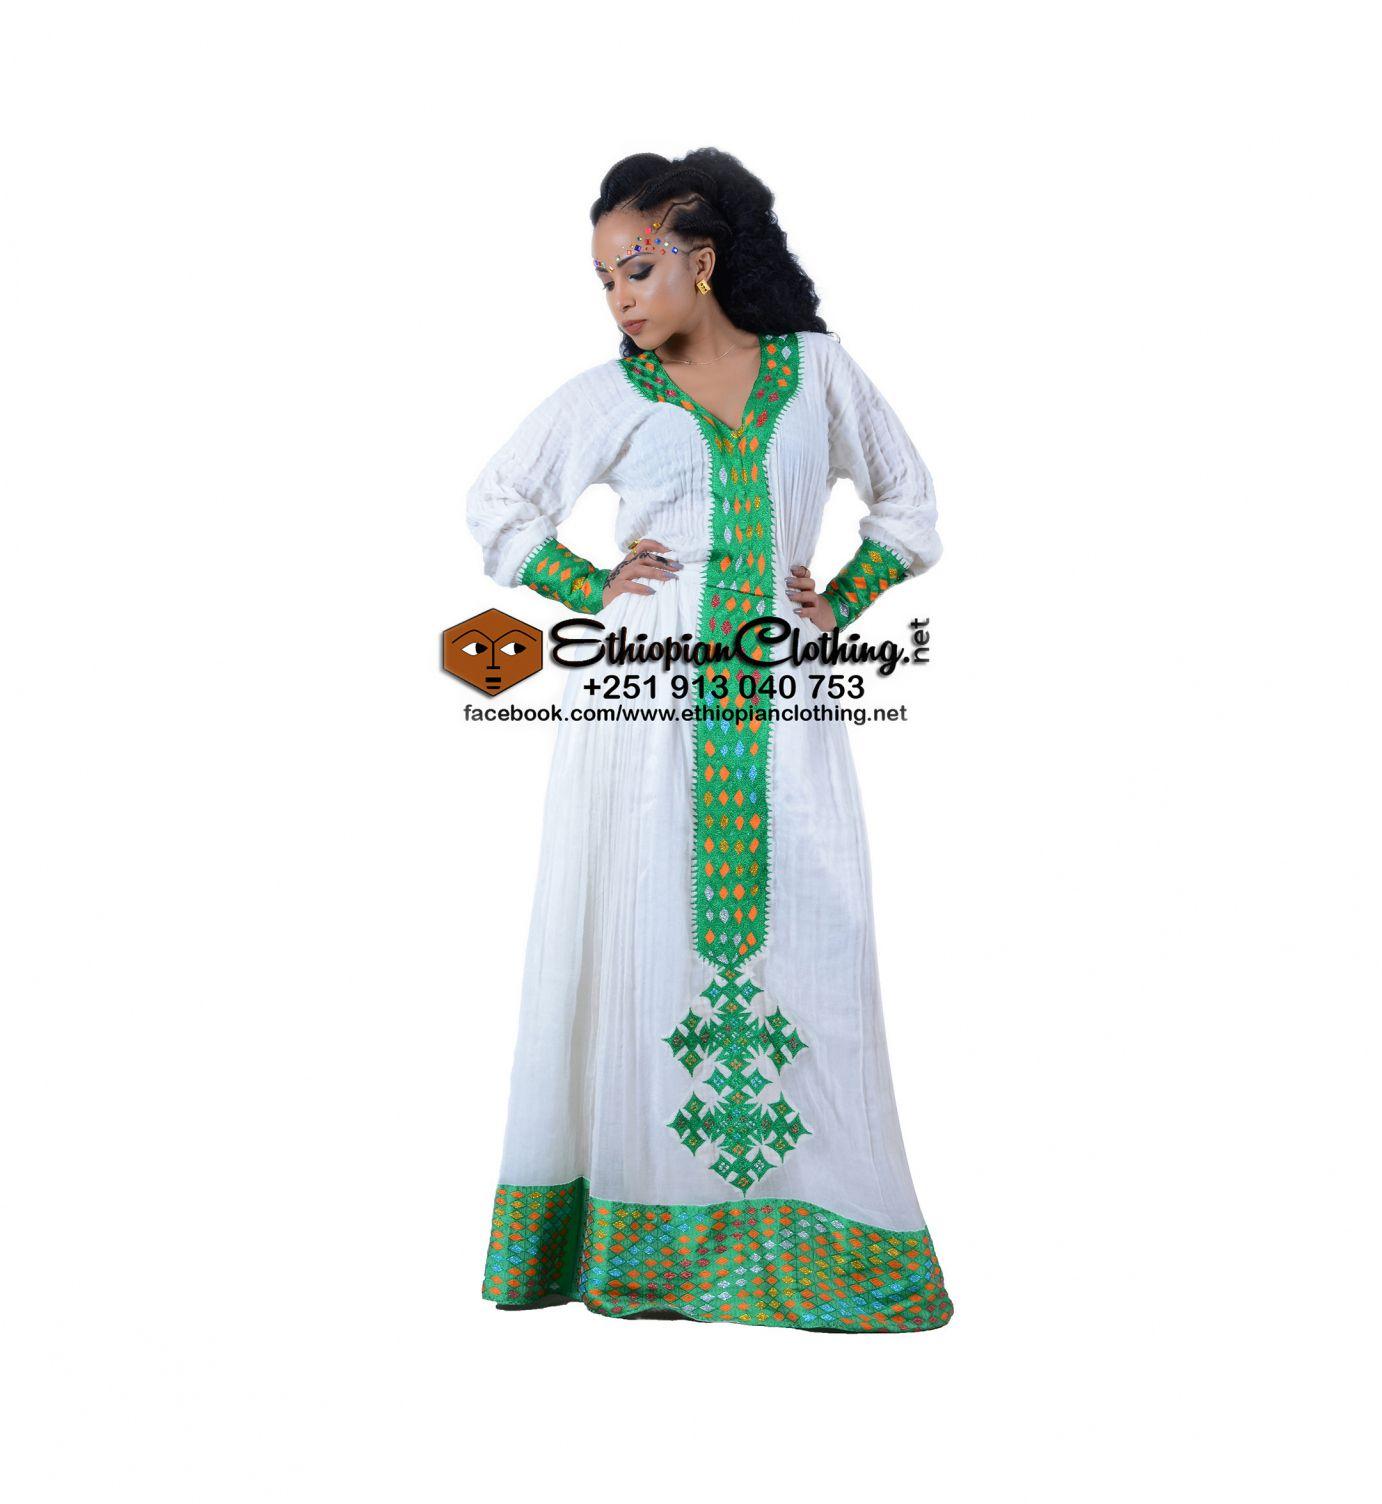 819af75c193 Ethiopian Cultural Wedding Dress - Dresses for Wedding Reception Check more  at http